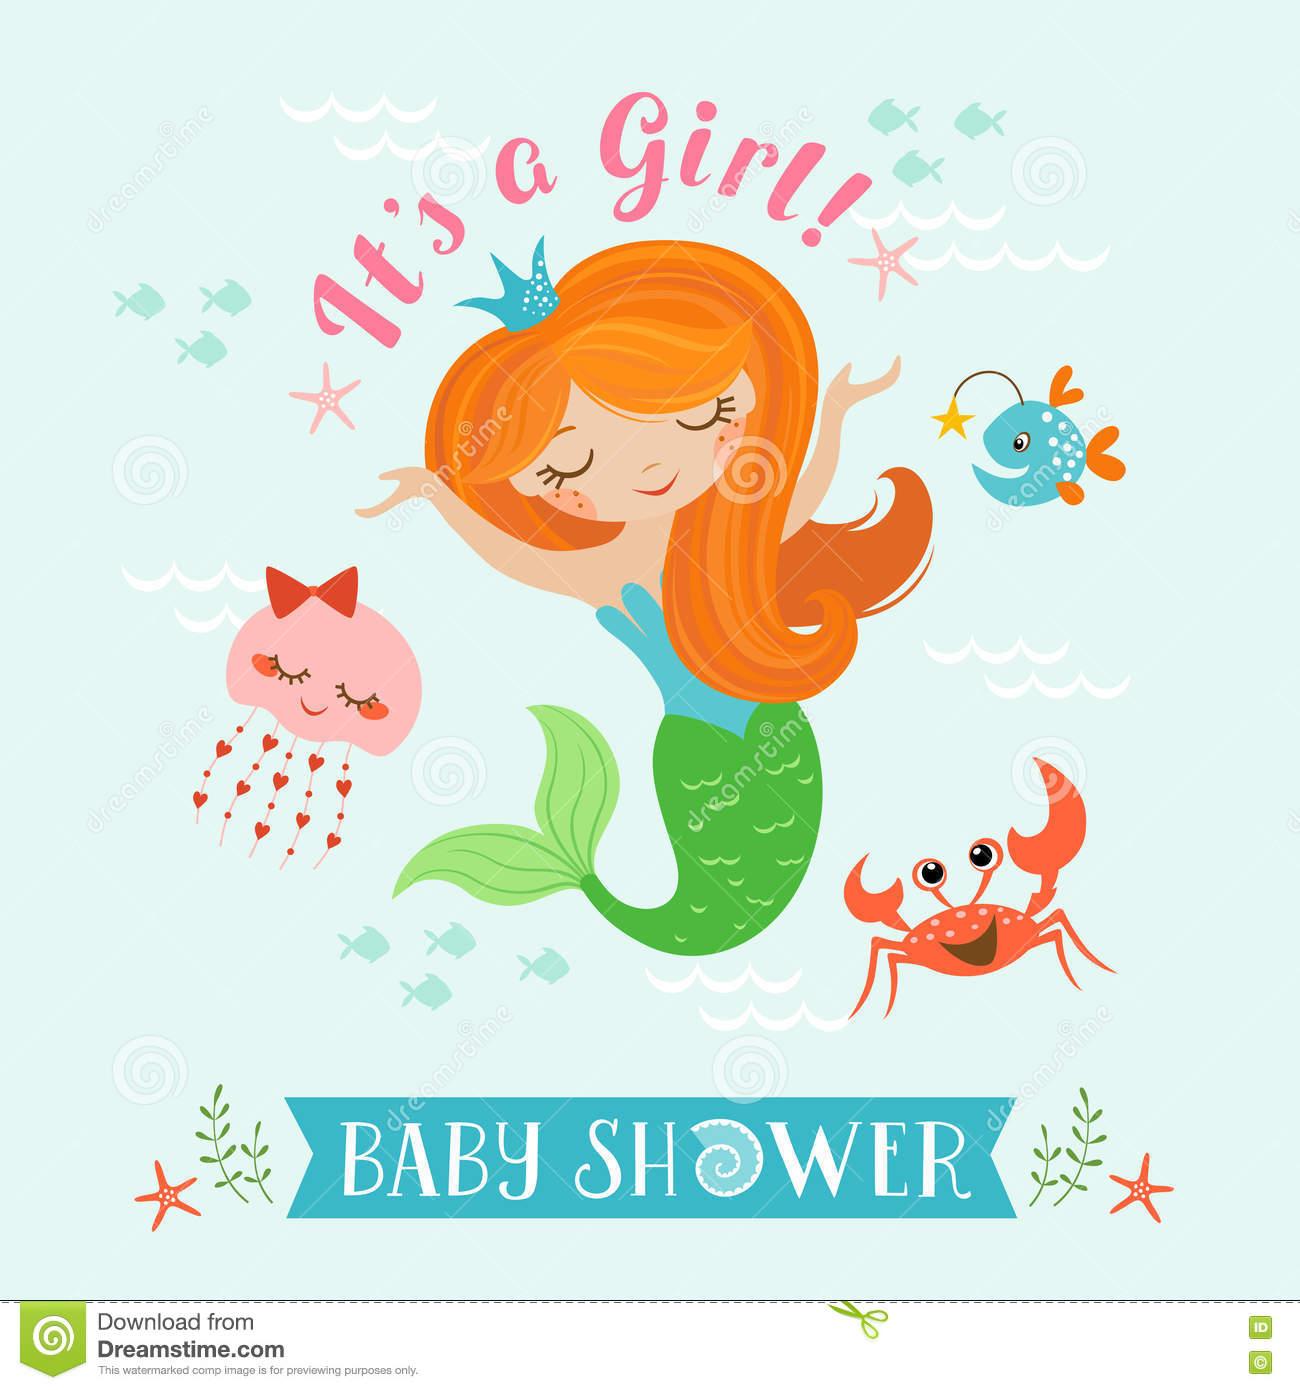 Mermaid baby shower stock vector. Illustration of mermaid.